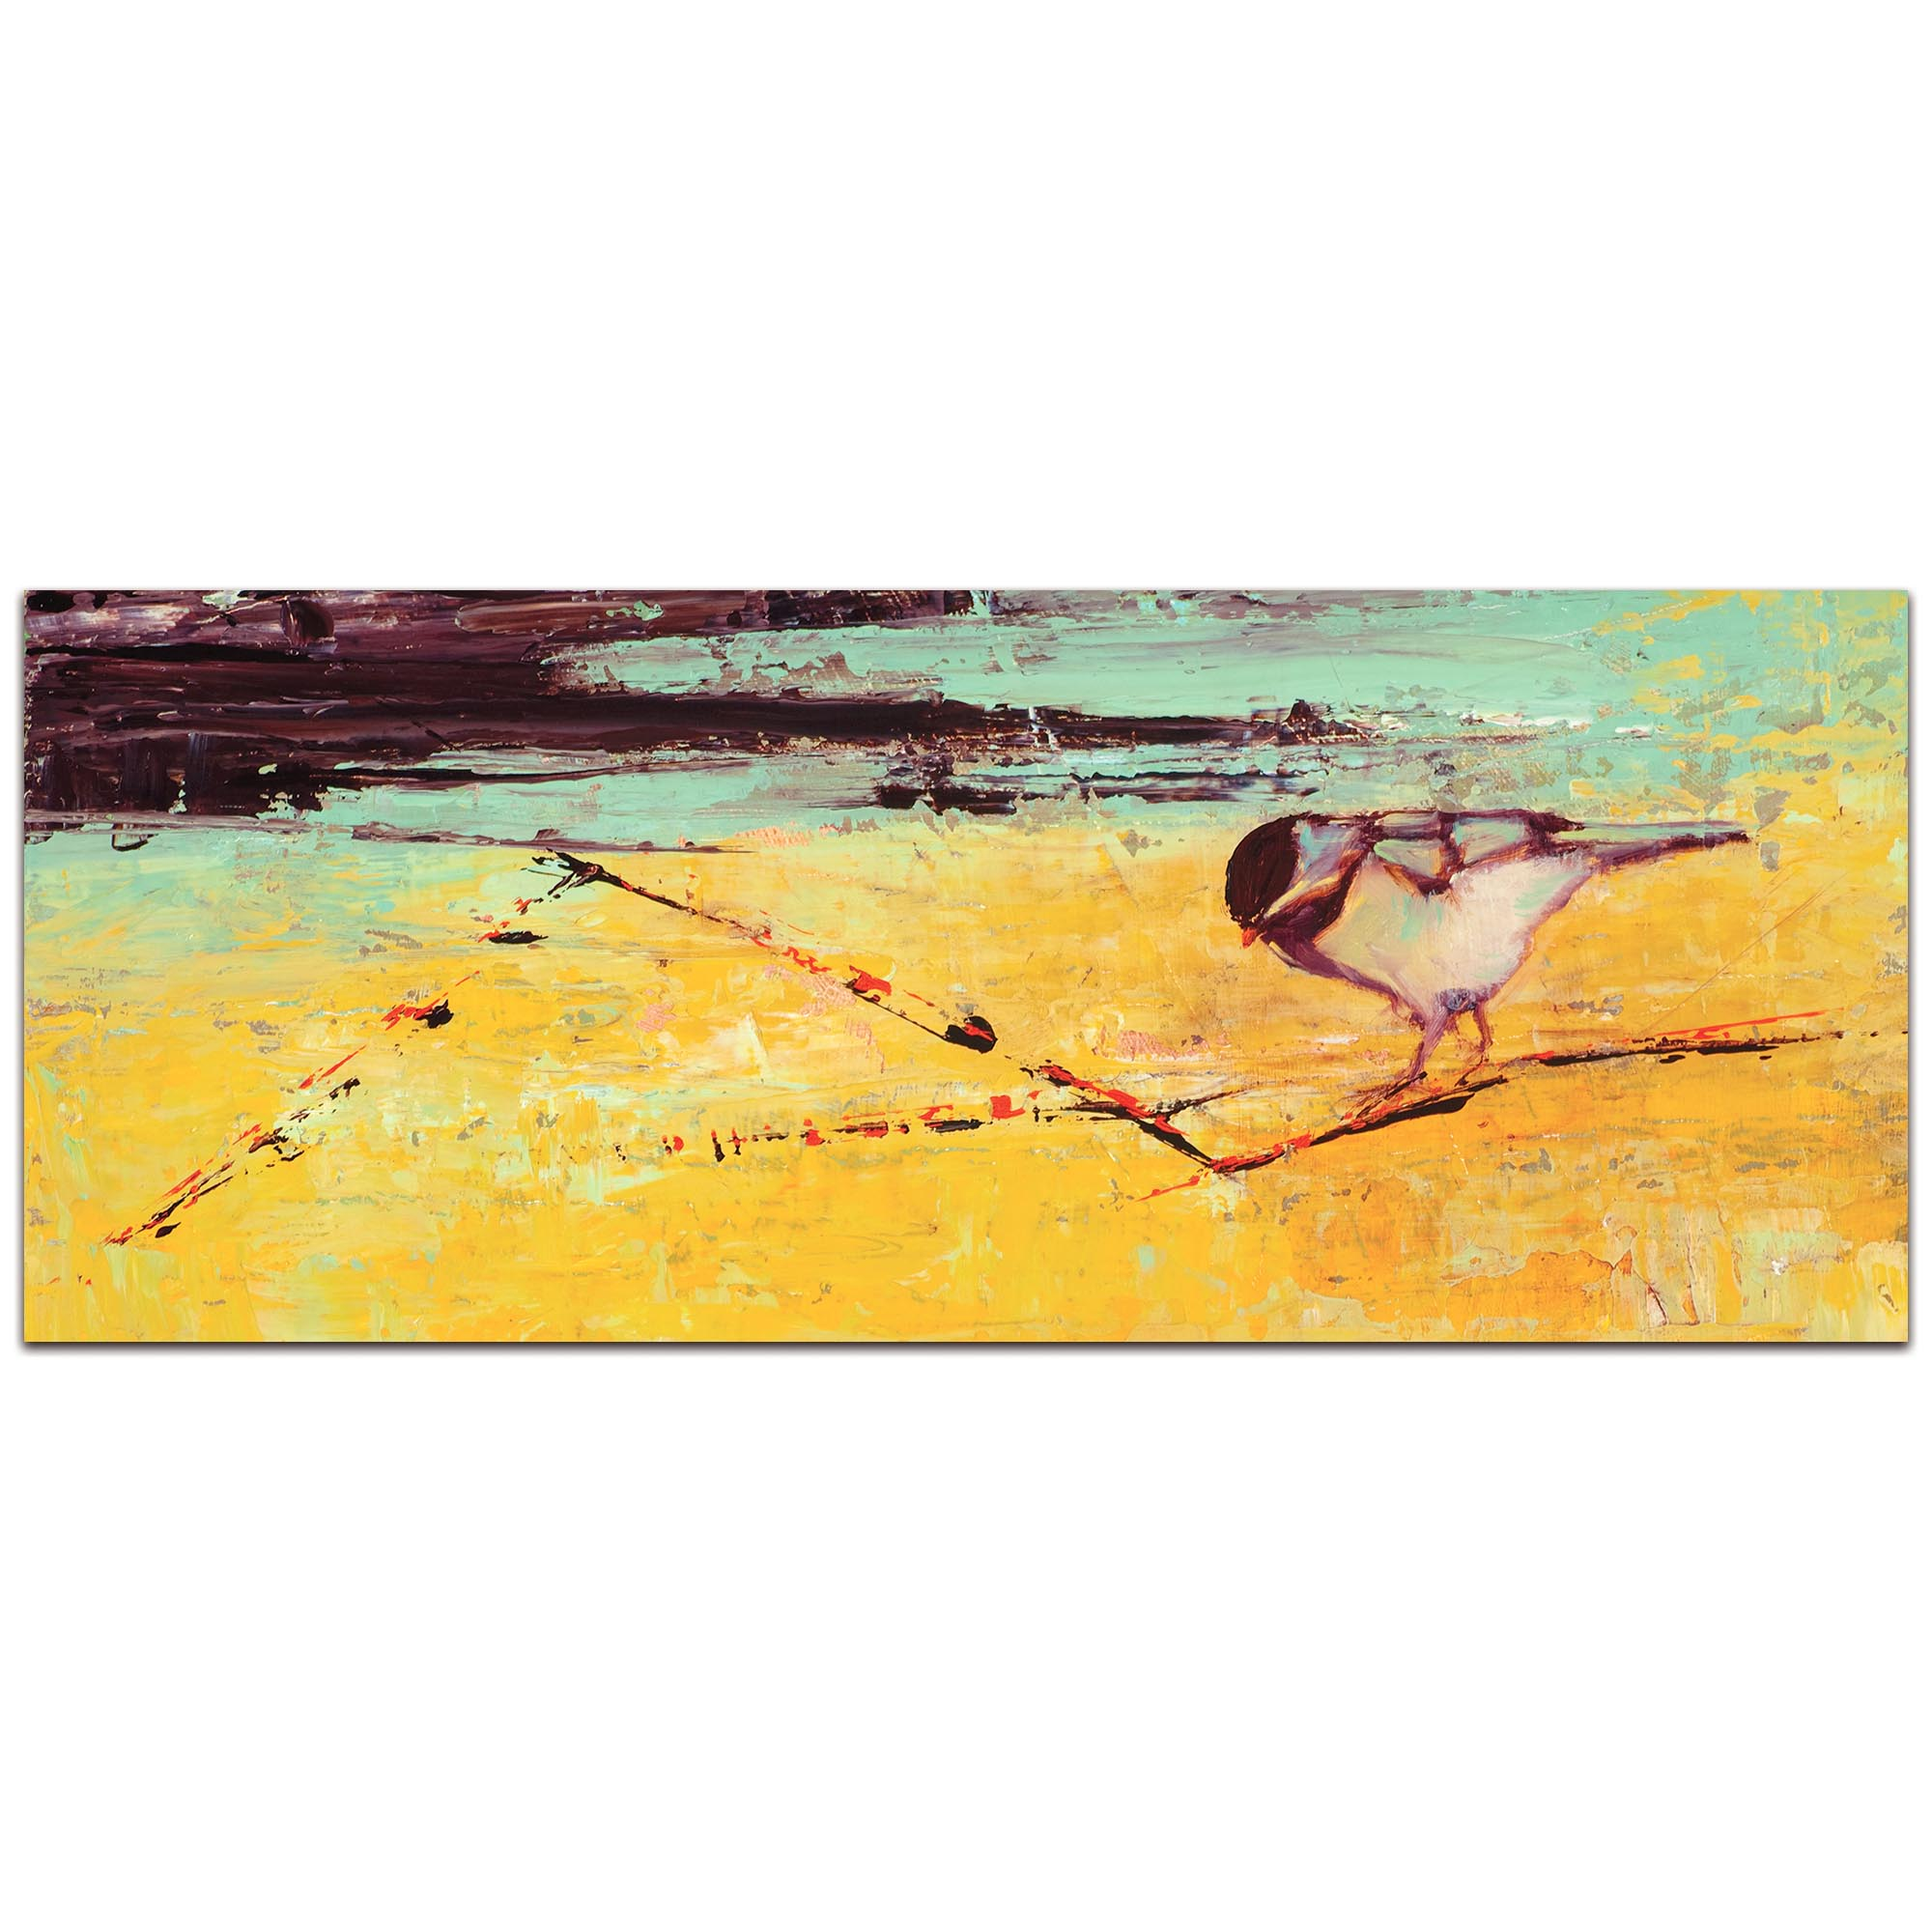 Contemporary Wall Art 'Bird on a Horizon v2' - Urban Birds Decor on Metal or Plexiglass